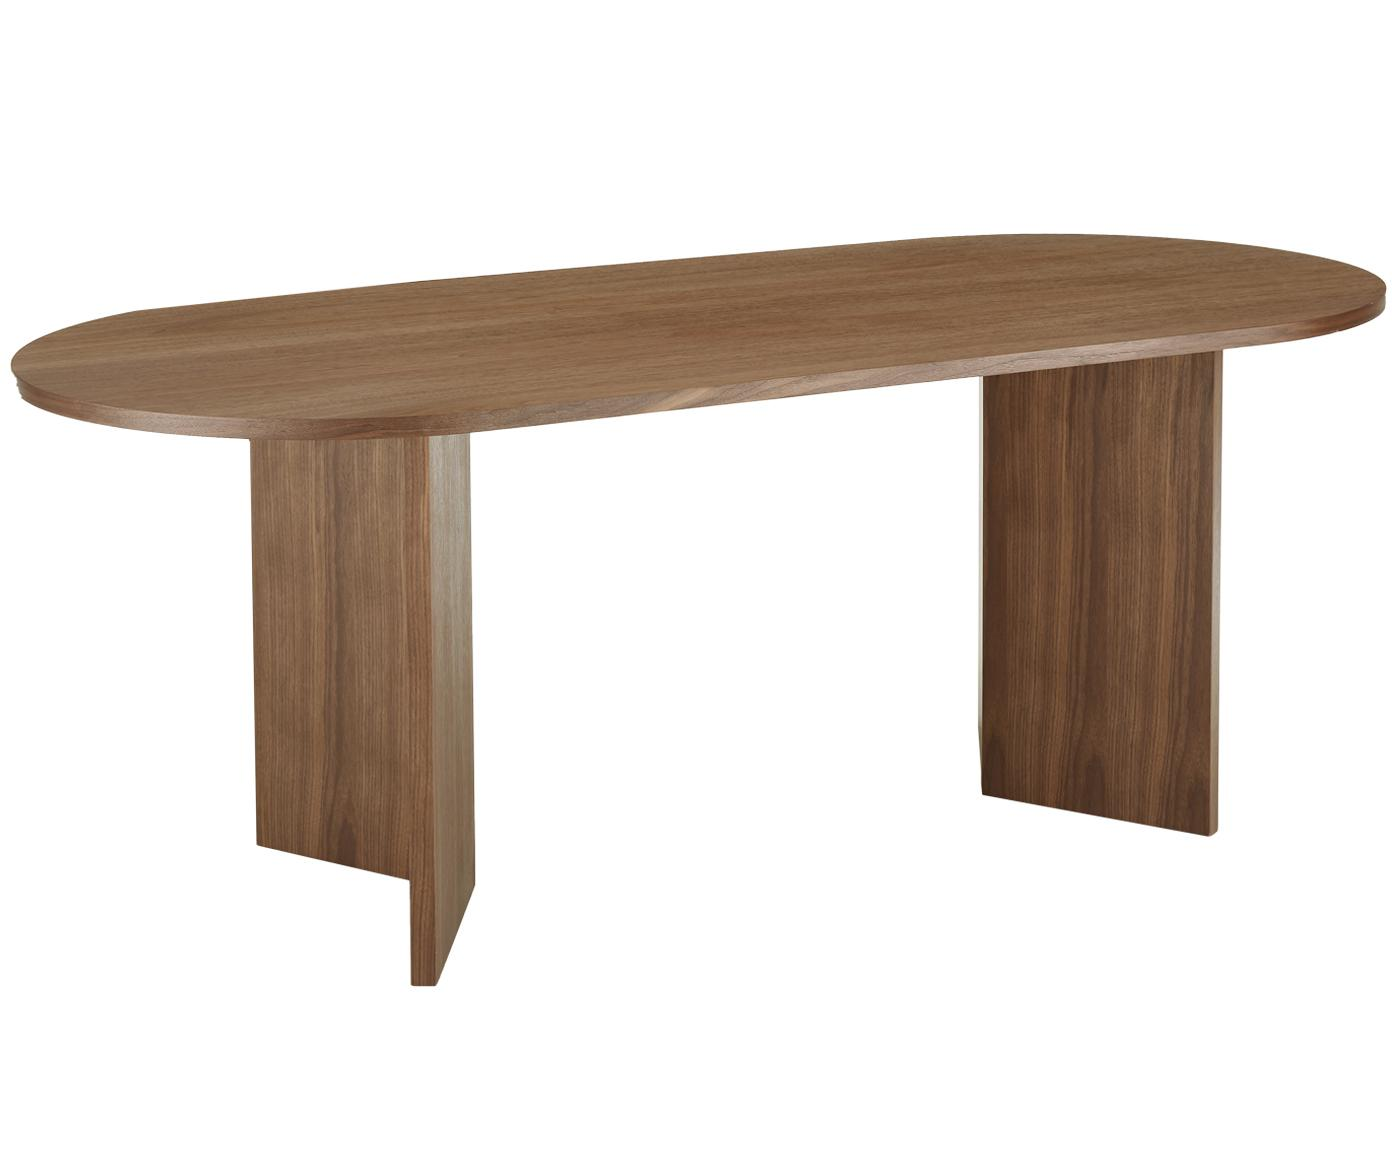 Mesa de comedor en madera Joni, Tablero de fibras de densidad media (MDF) chapado en madera de nogal pintado, Nogal, An 200 x F 90 cm